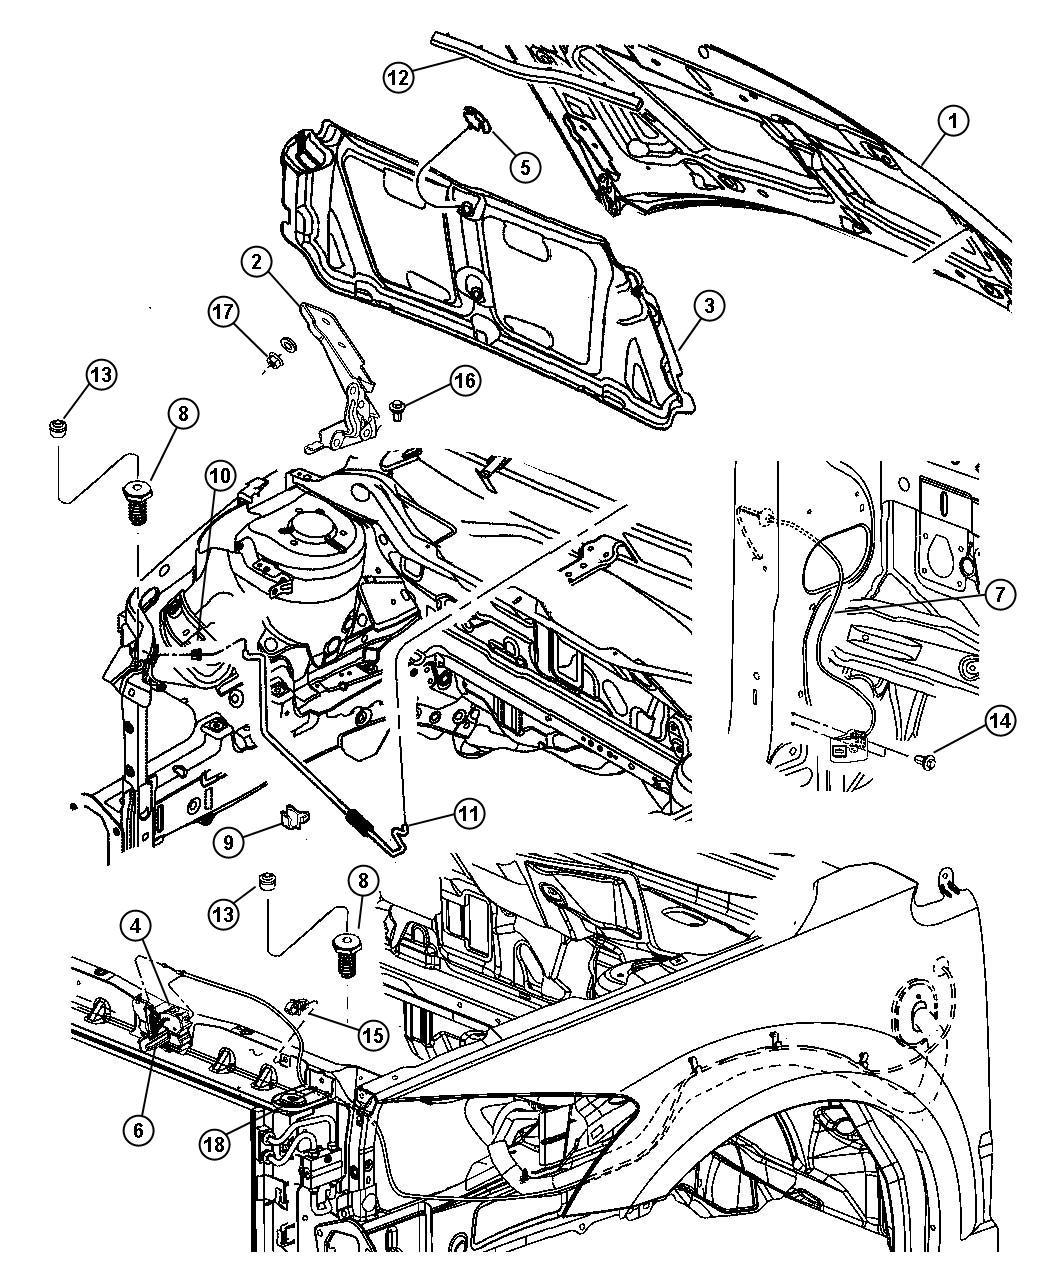 Dodge Caliber Latch Hood Remote Start System